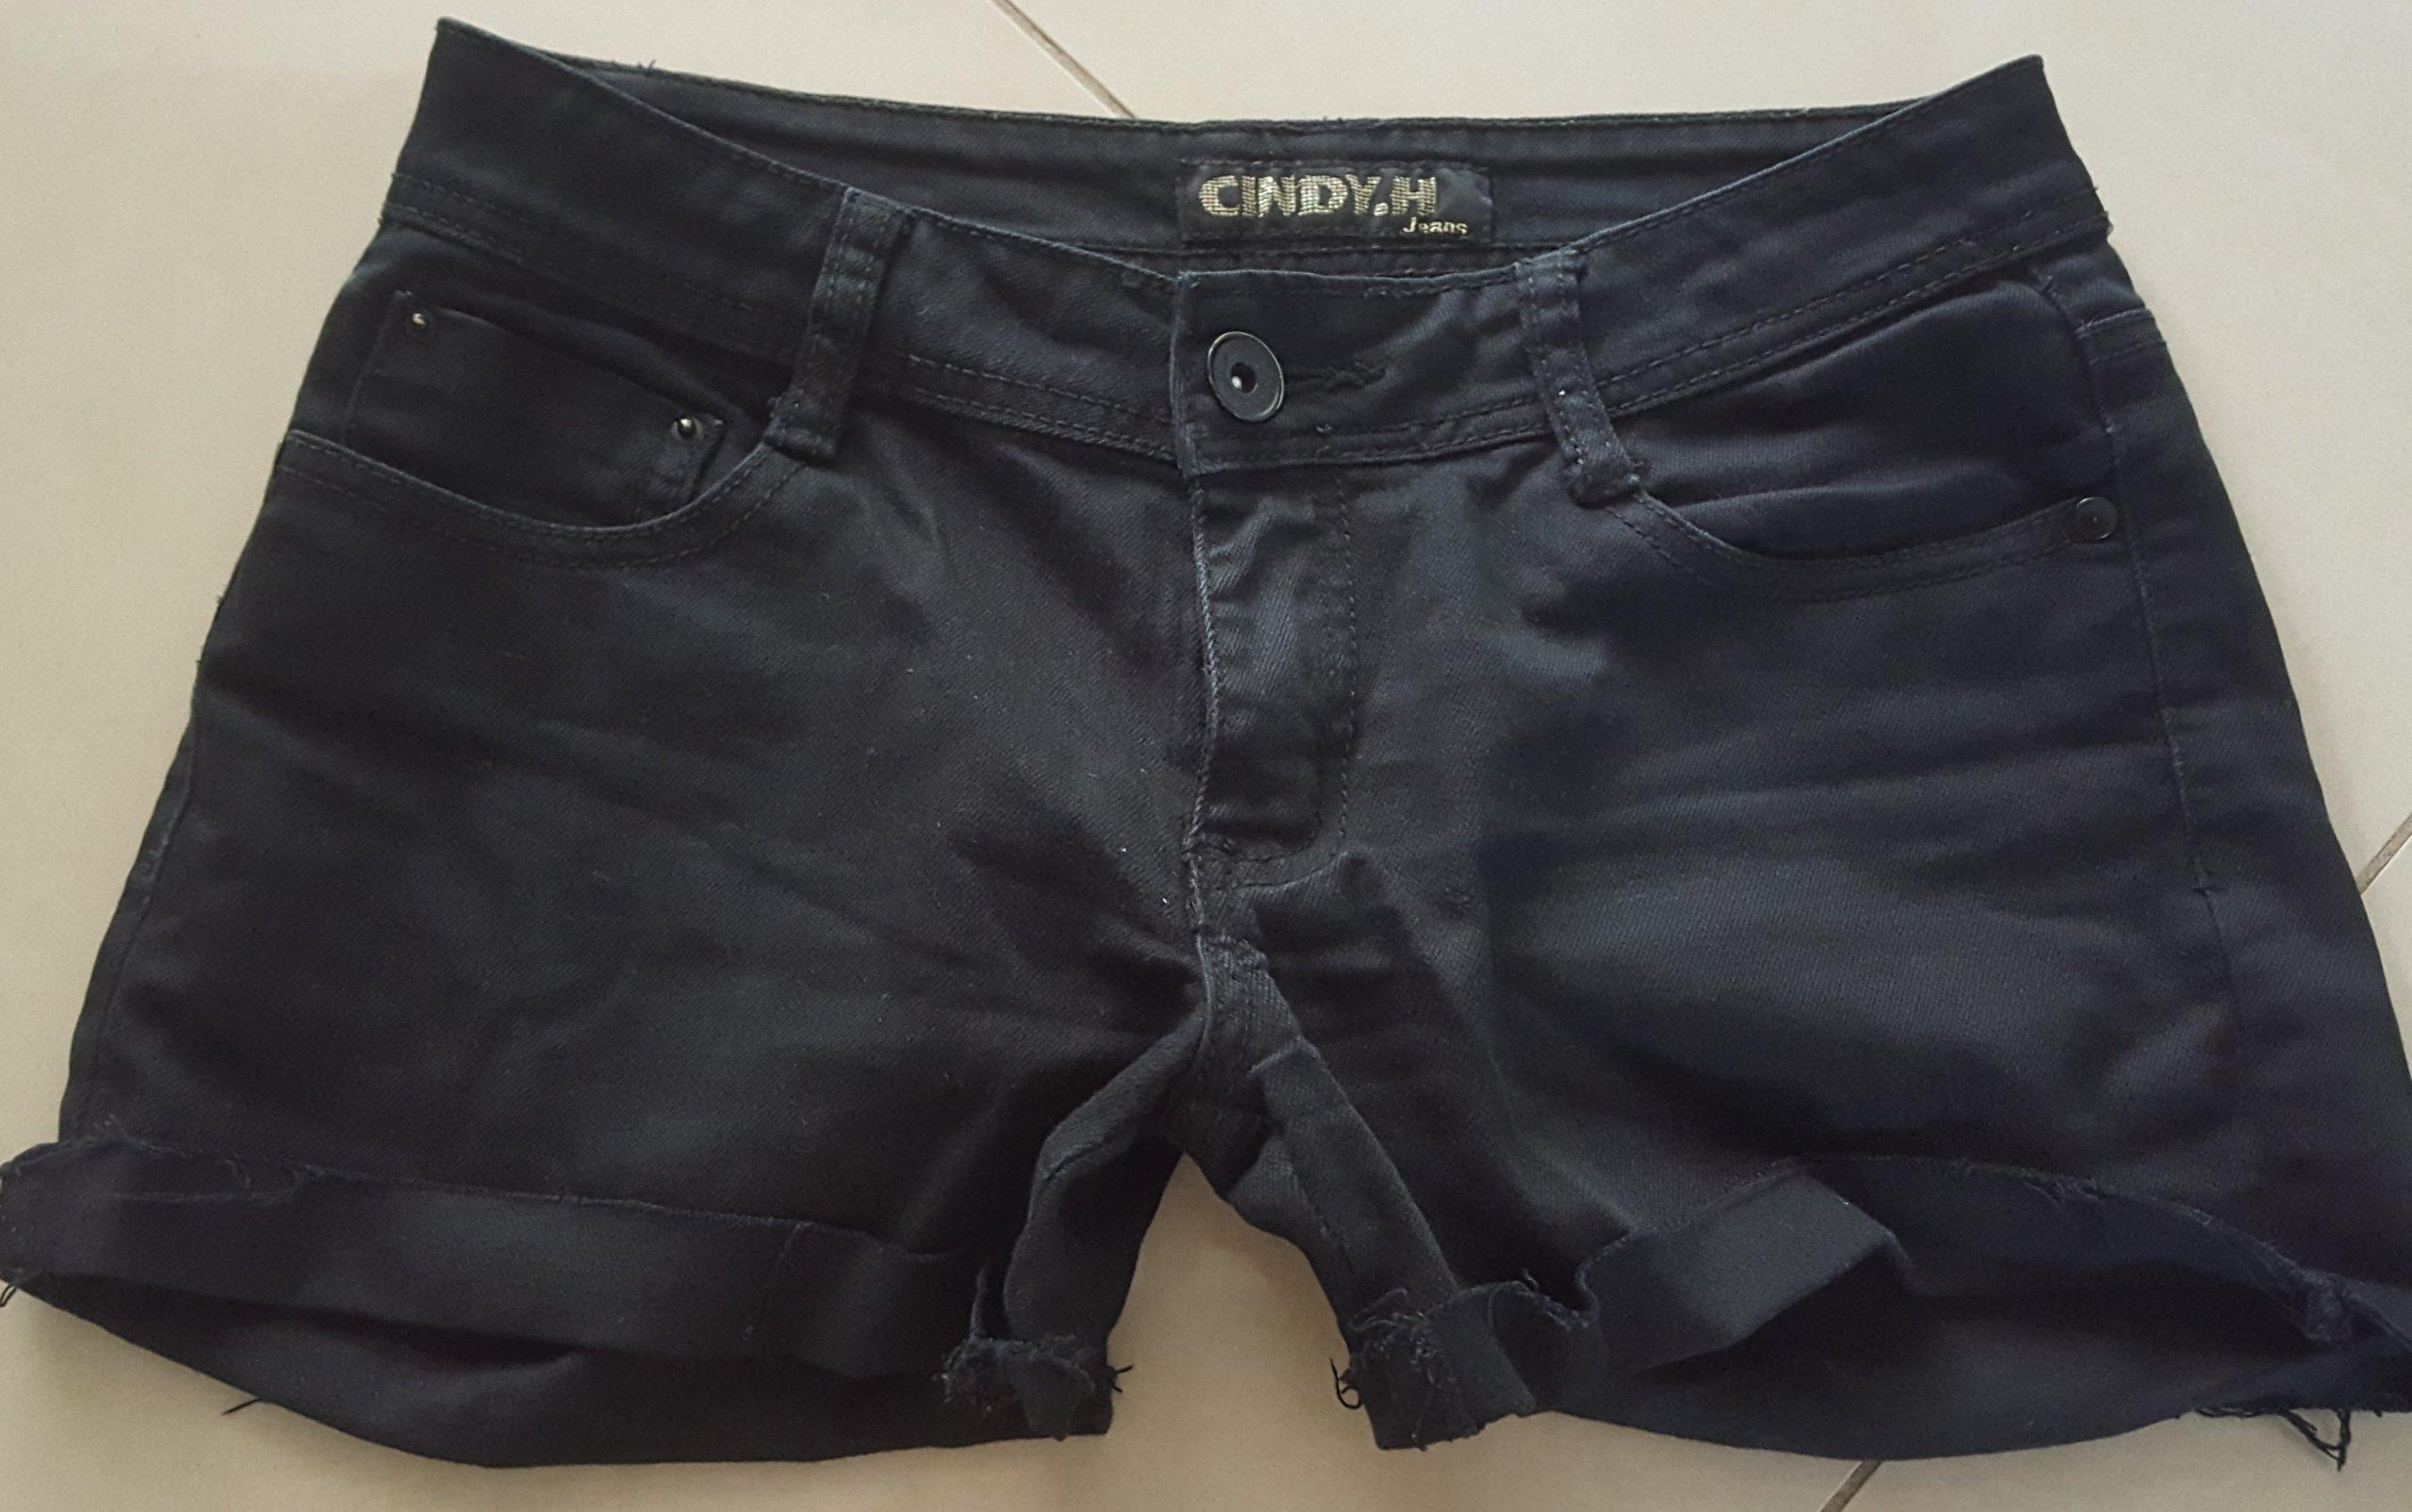 7d7d017ee6 Cindy.H jeansowe spodenki  38 - 7398296549 - oficjalne archiwum allegro